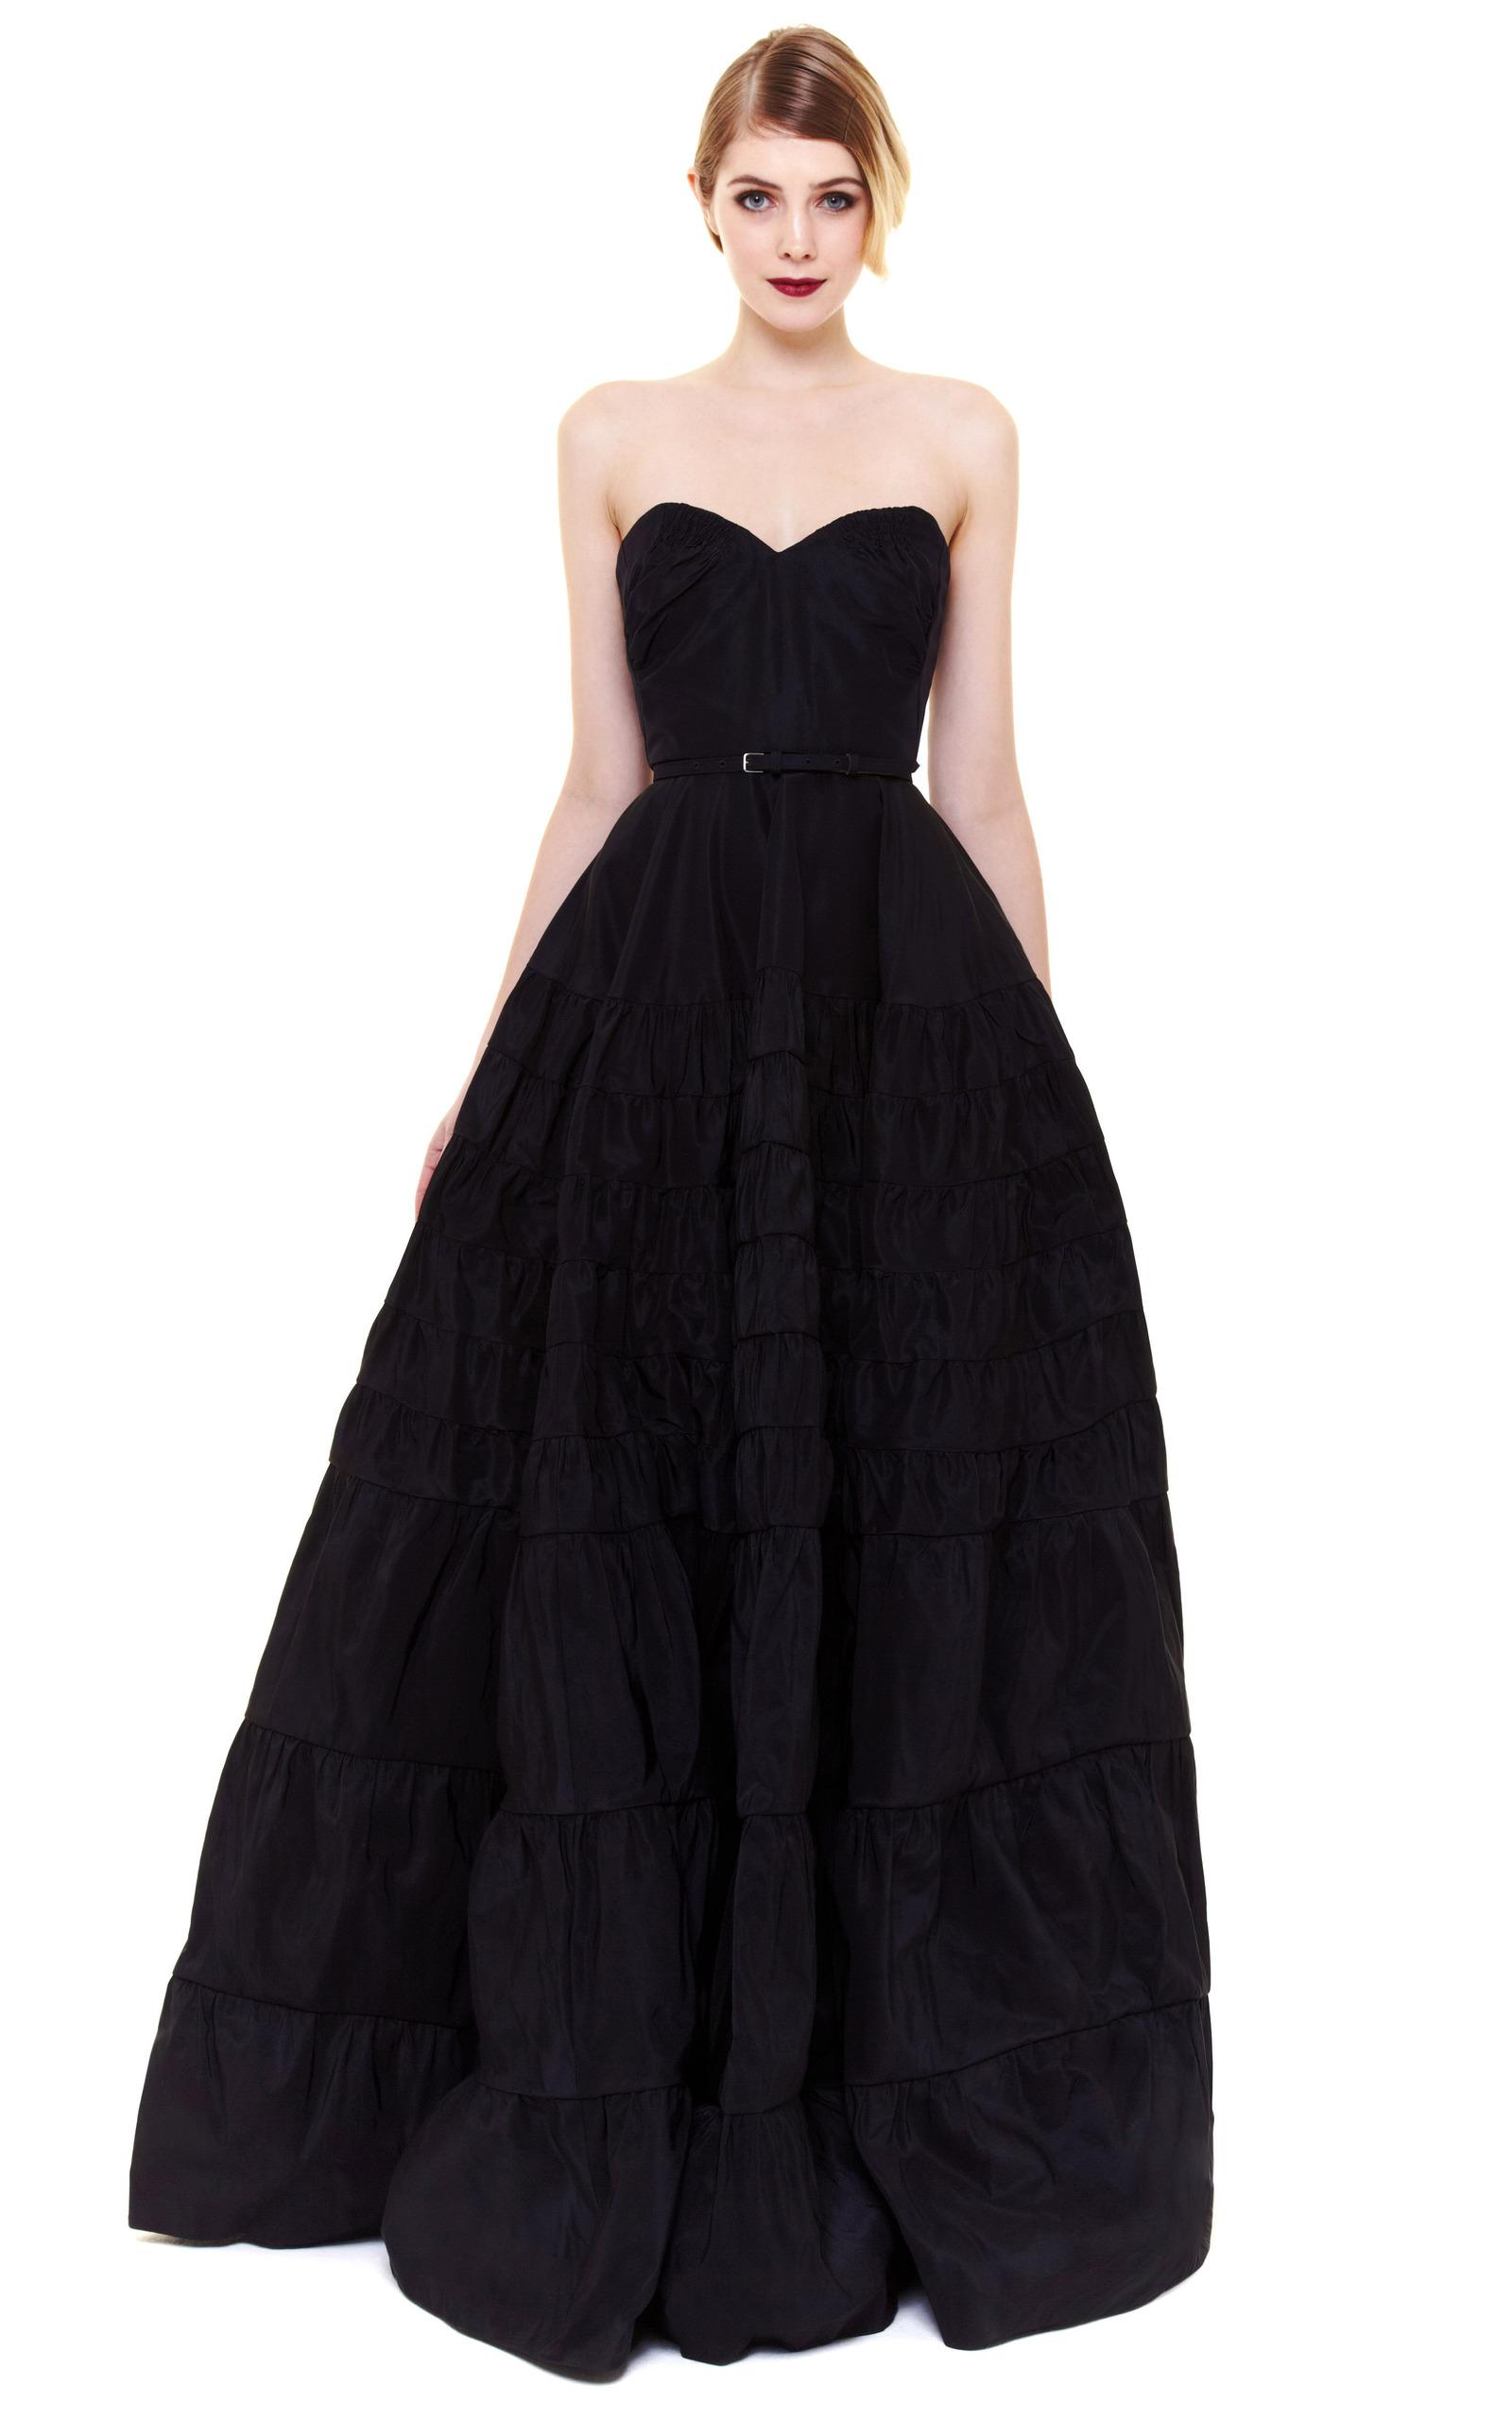 Western Style Dresses